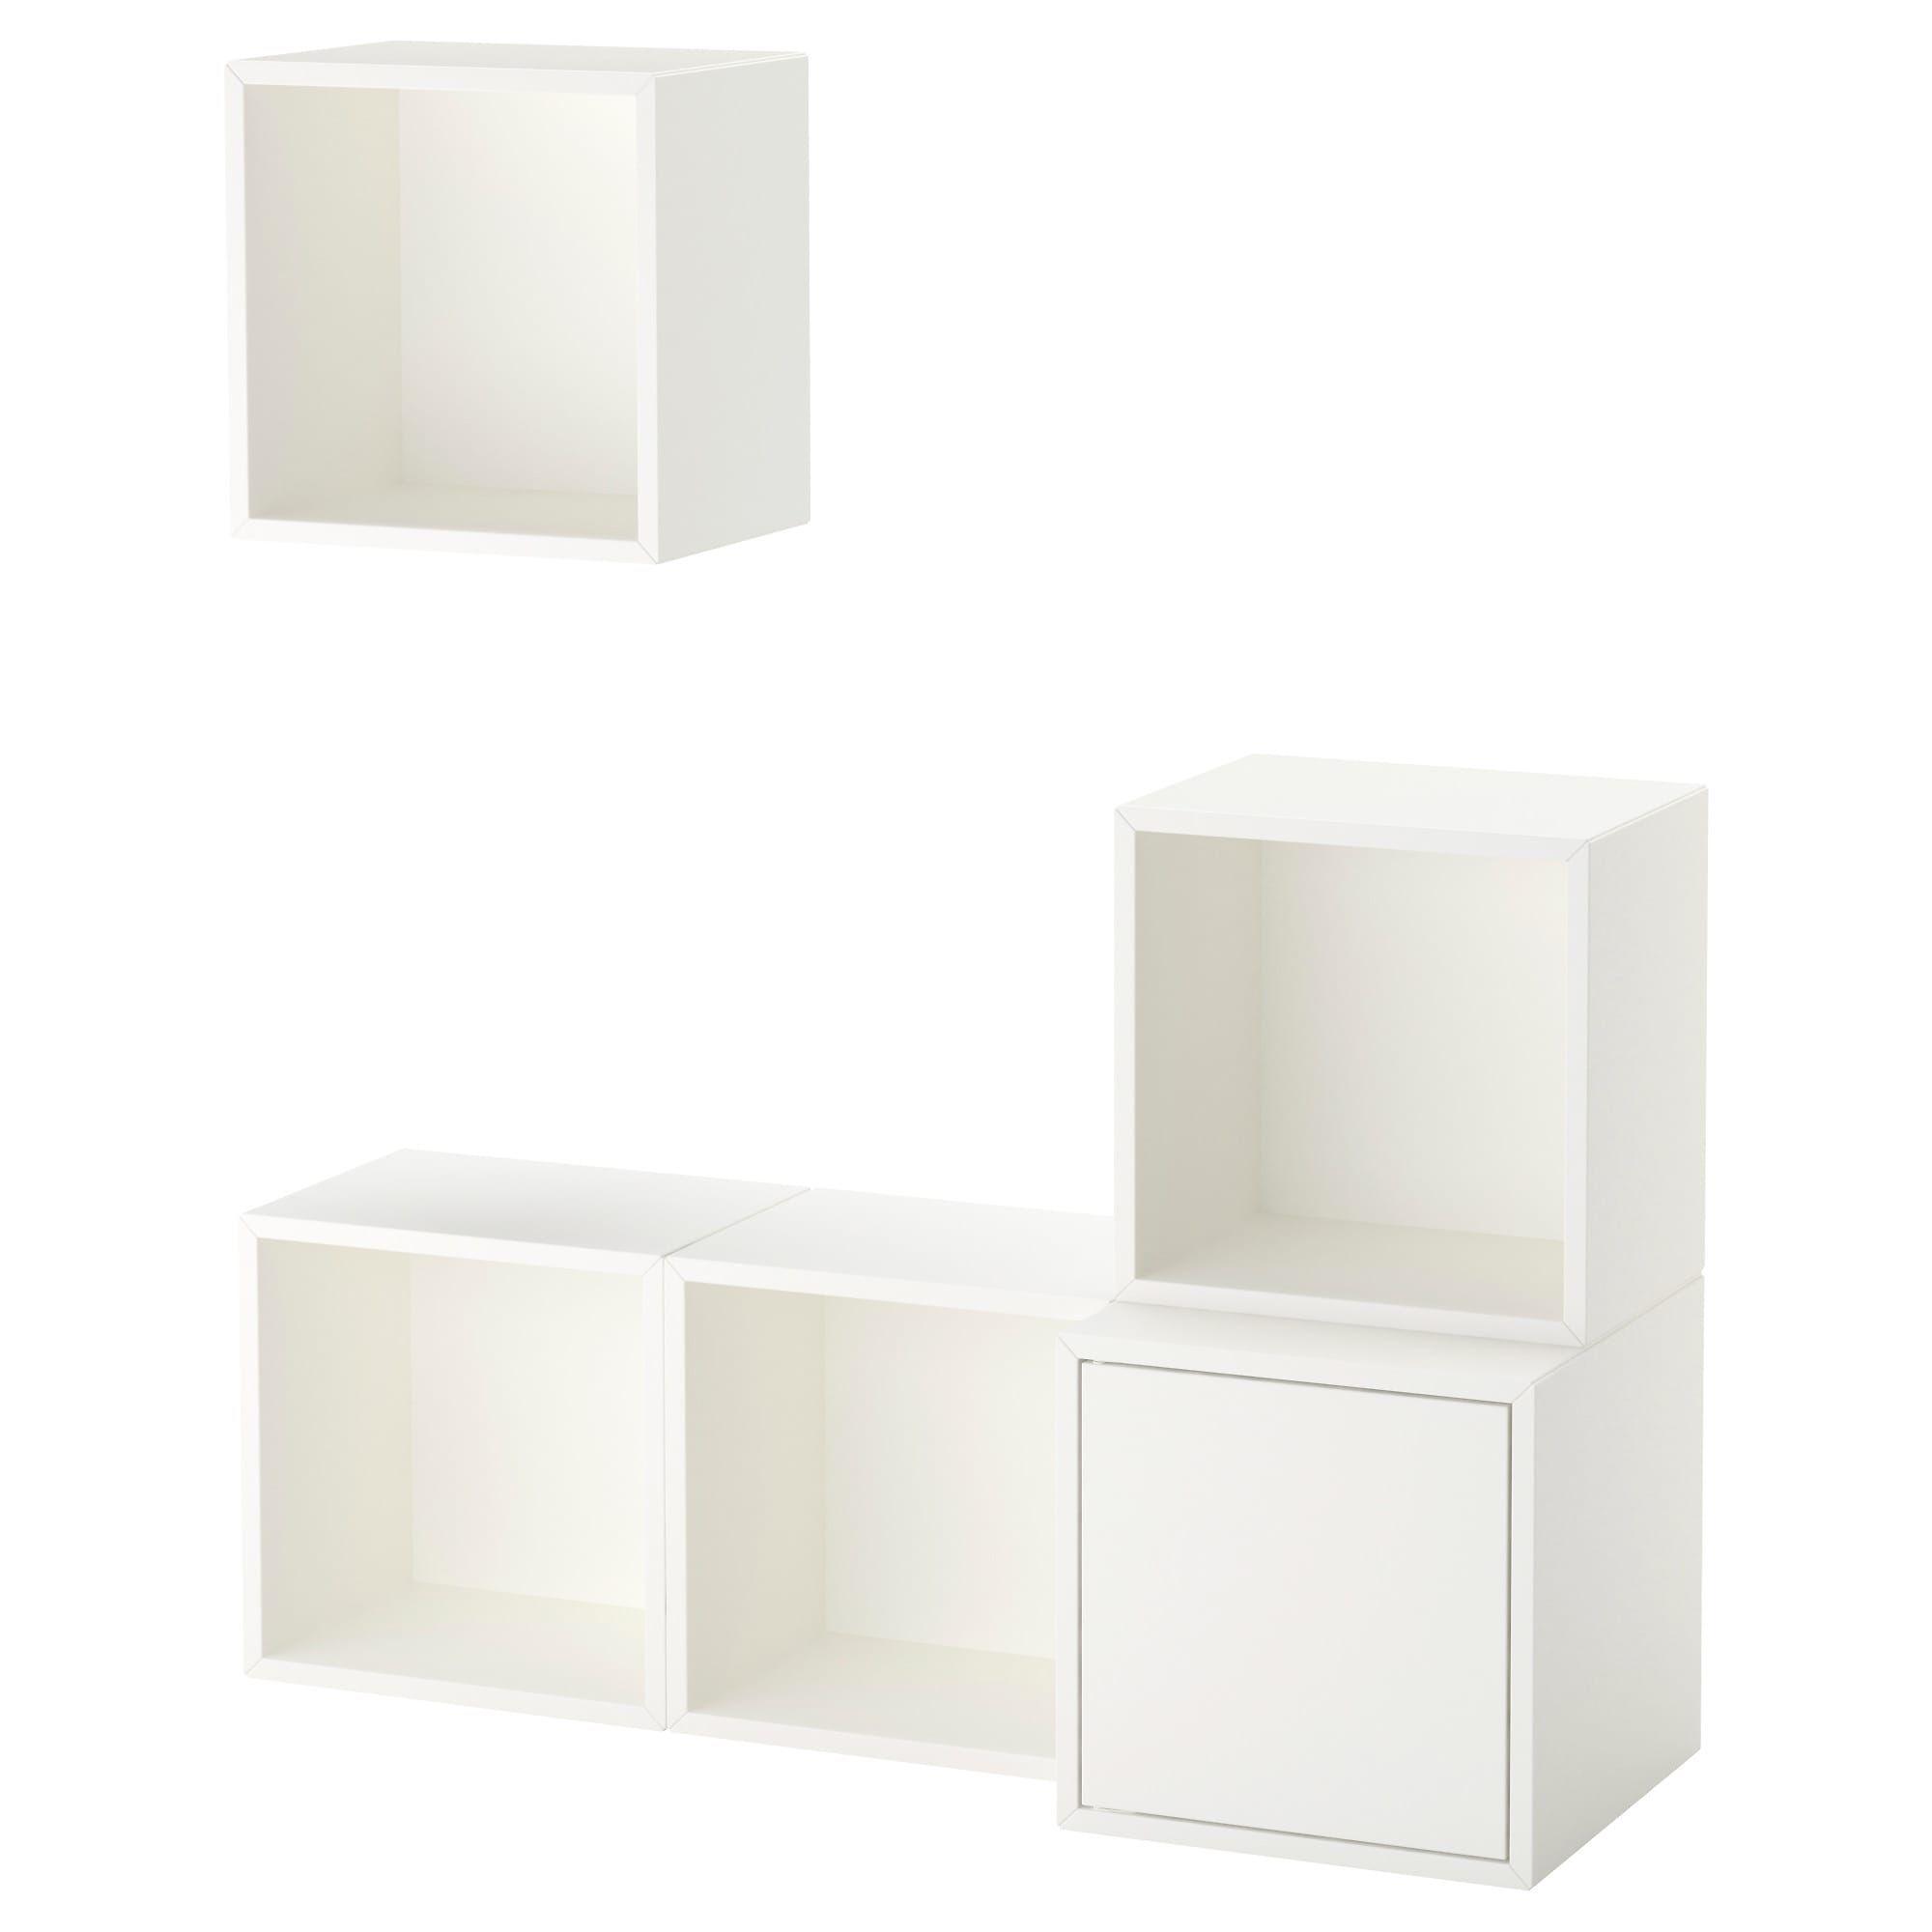 EKET Wallmounted combination white 41 3/8x13 3